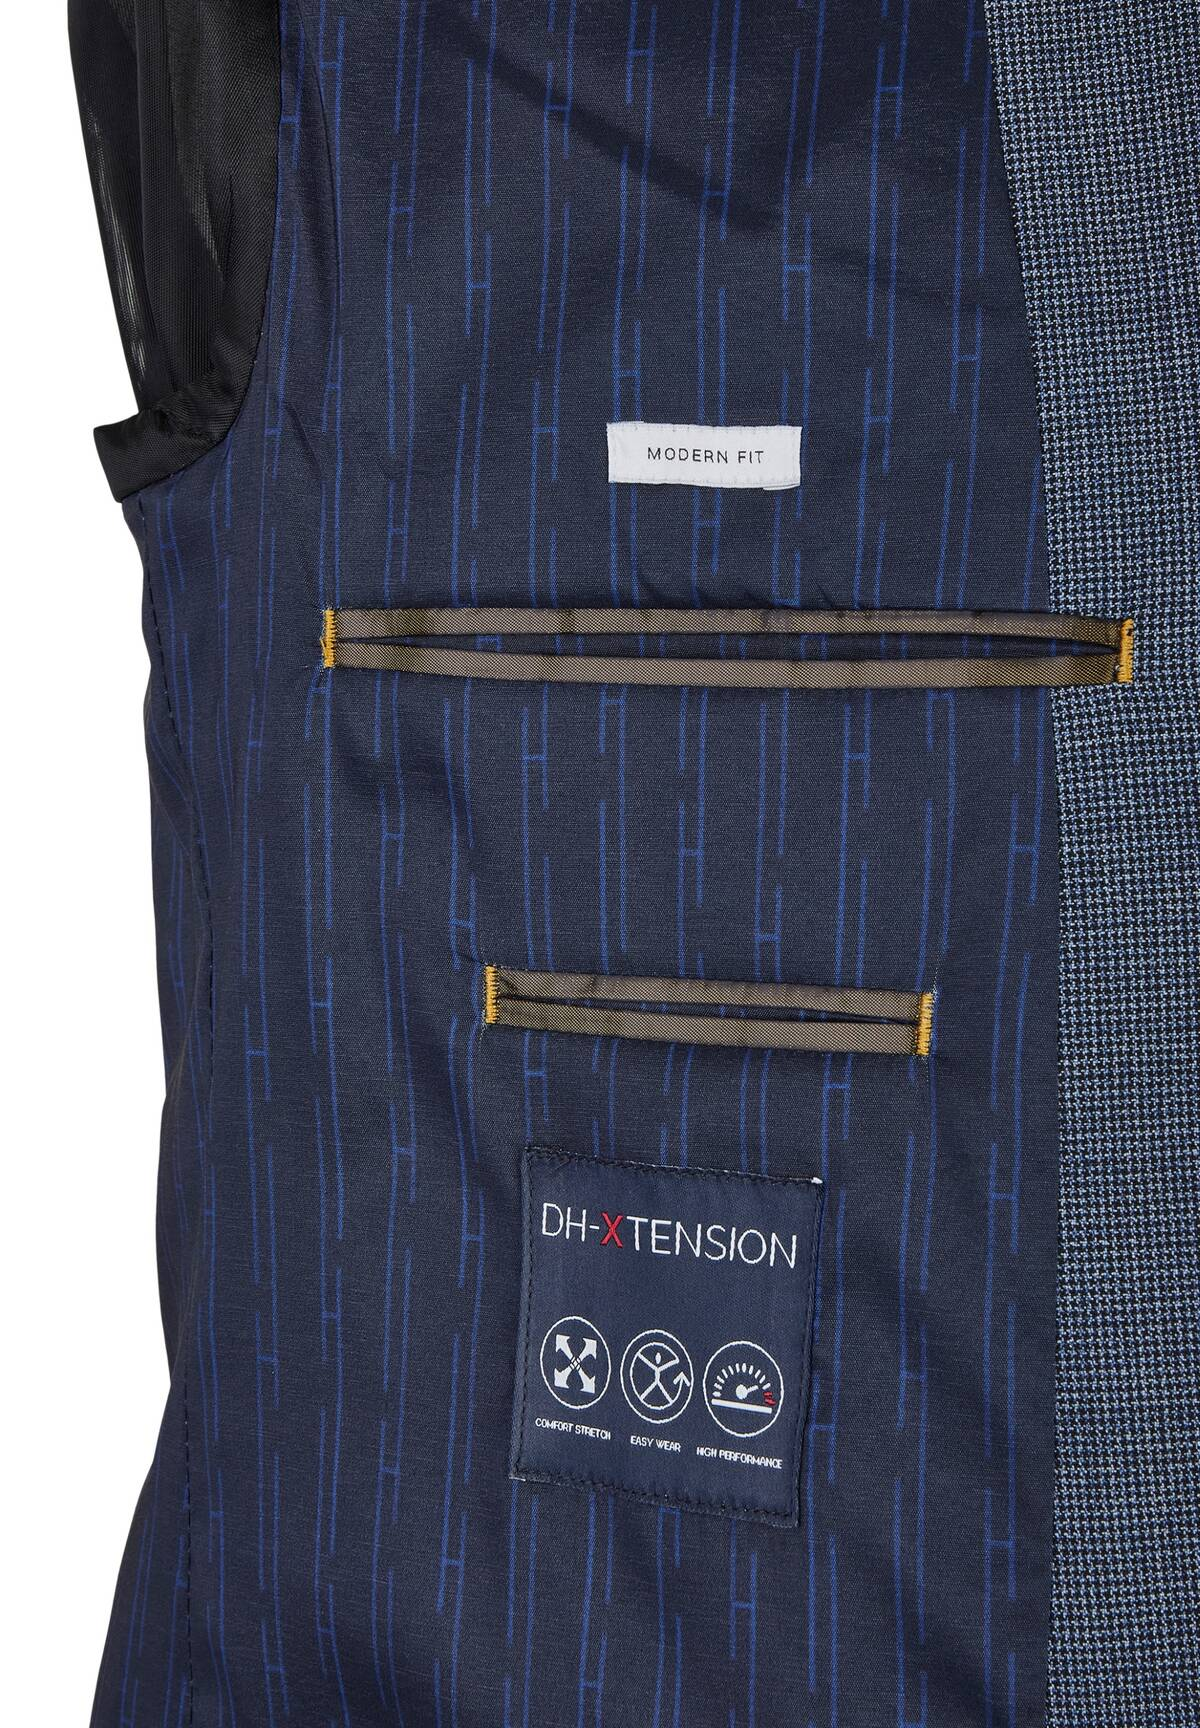 DH-XTENSION Modern Fit Anzug Sakko / DH-XTENSION Modern Fit Anzug Sakko